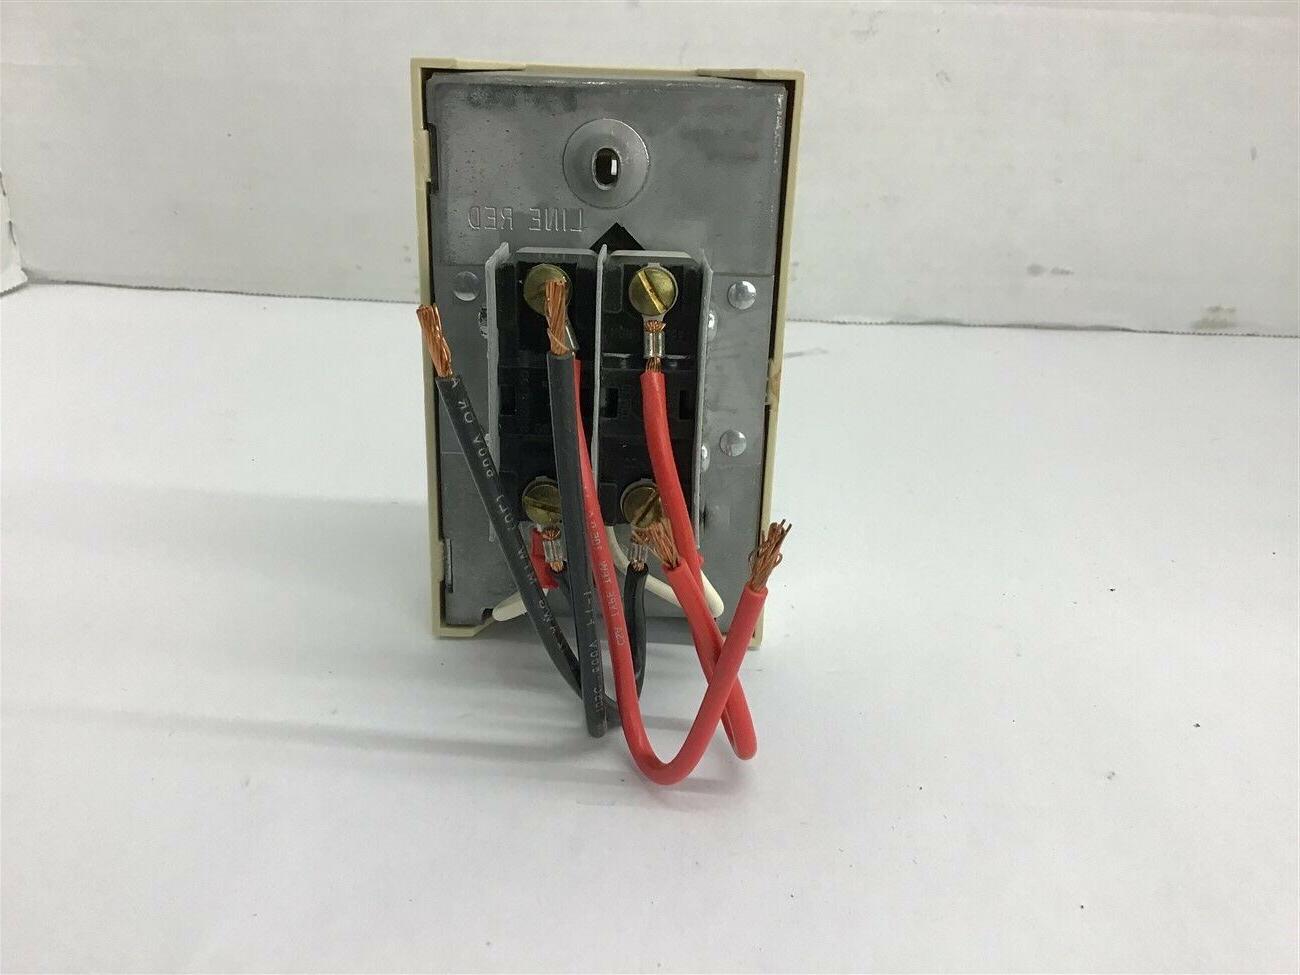 Columbus AET5DW1 Voltage Heating Thermostat 50-90 F